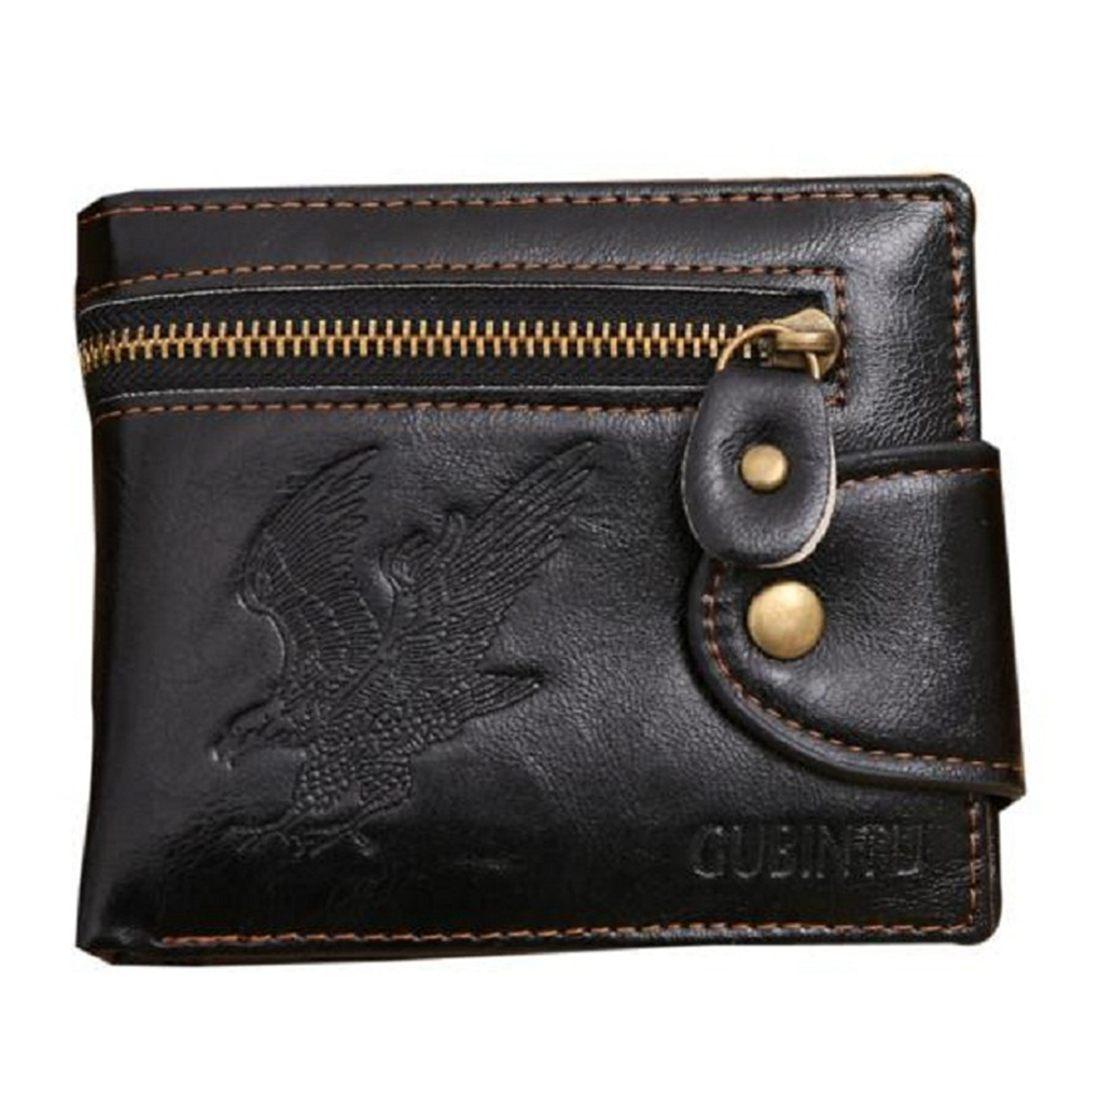 Fashion Gubintu Men's New Fashion High Quality Mini Zipper Wallet Male Pu Leather Card Cash Receipt Bags Holder Boys Clutch Pu